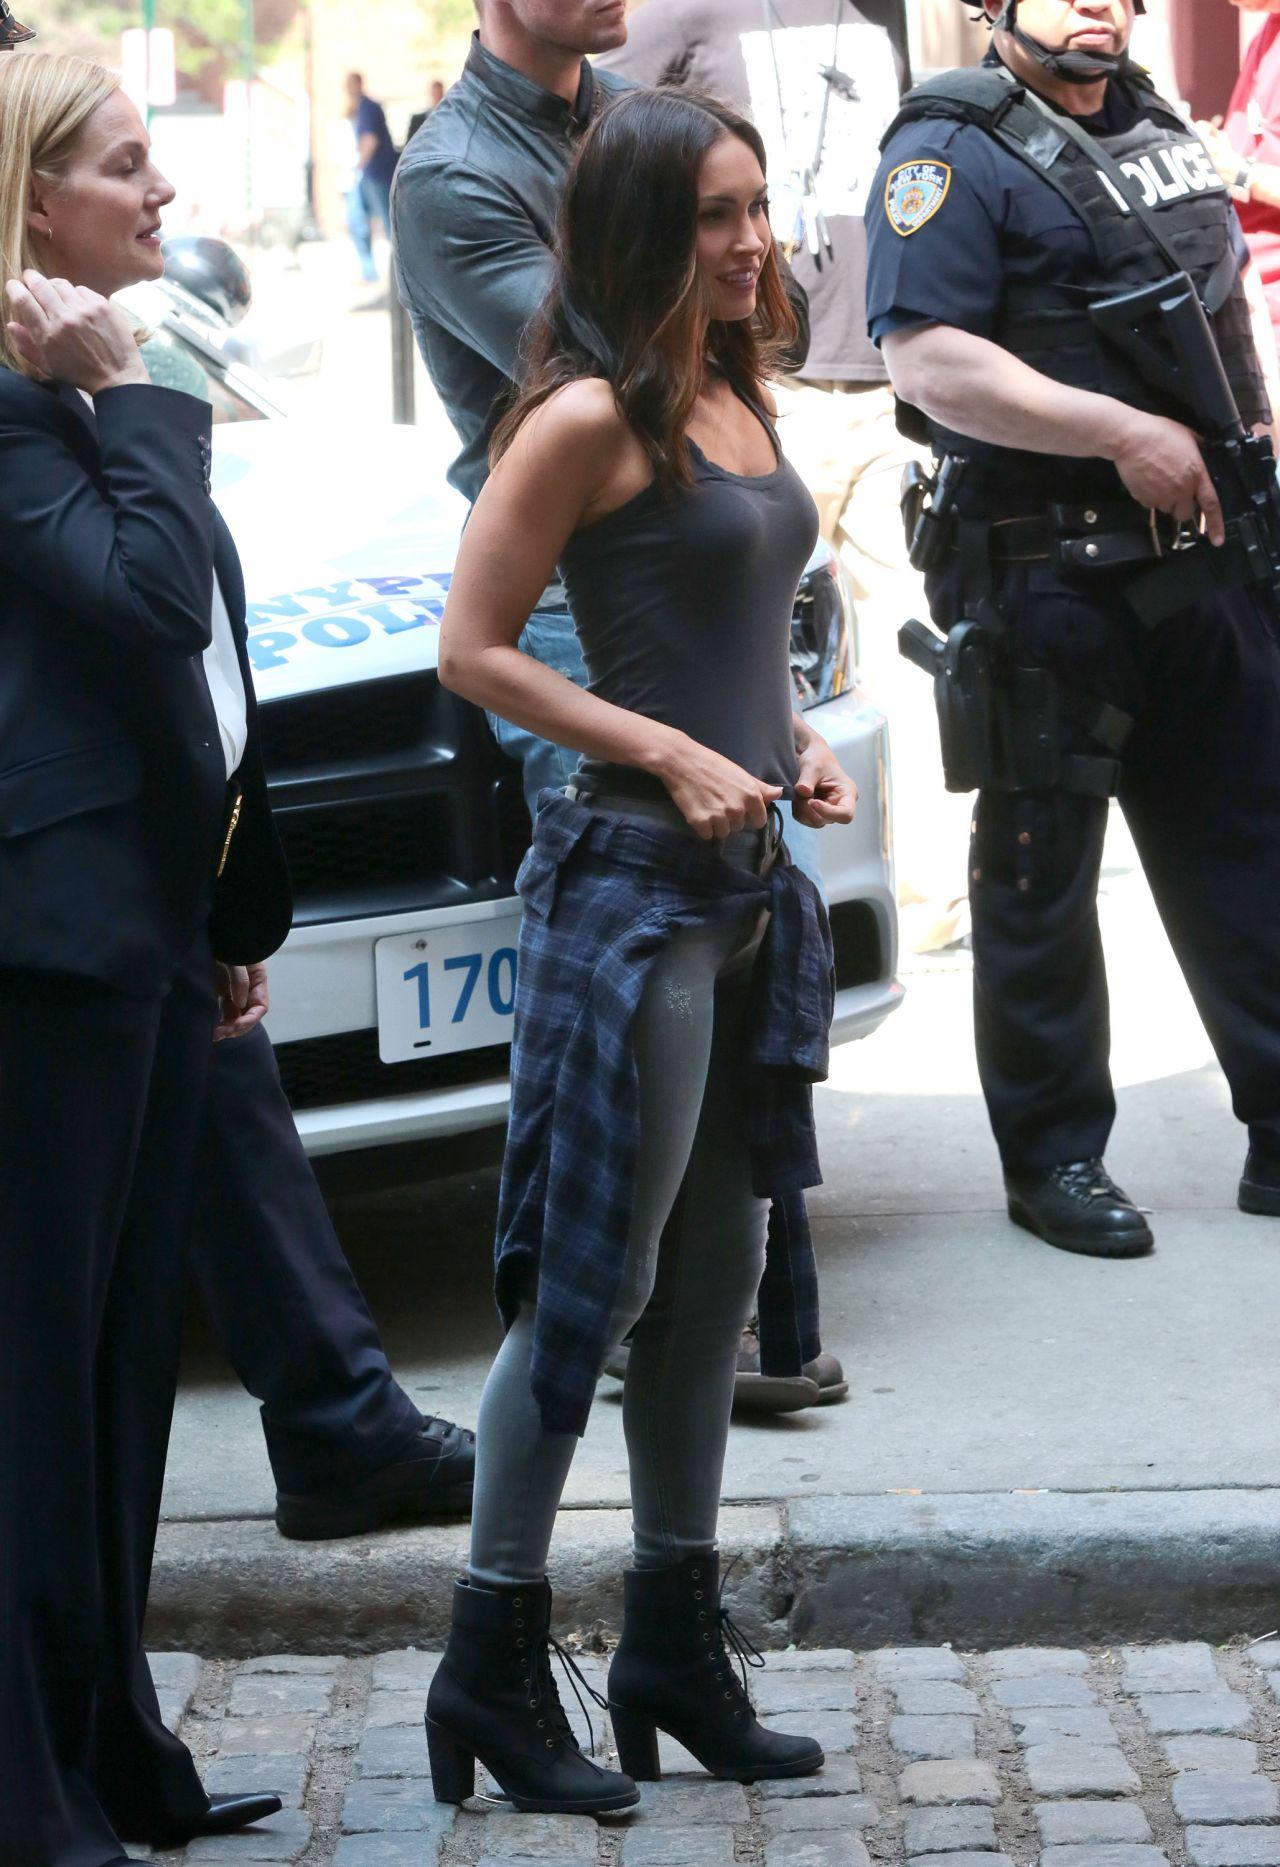 Megan Fox On Set Of Teenage Mutant Ninja Turtles 2 In Nyc May 2015